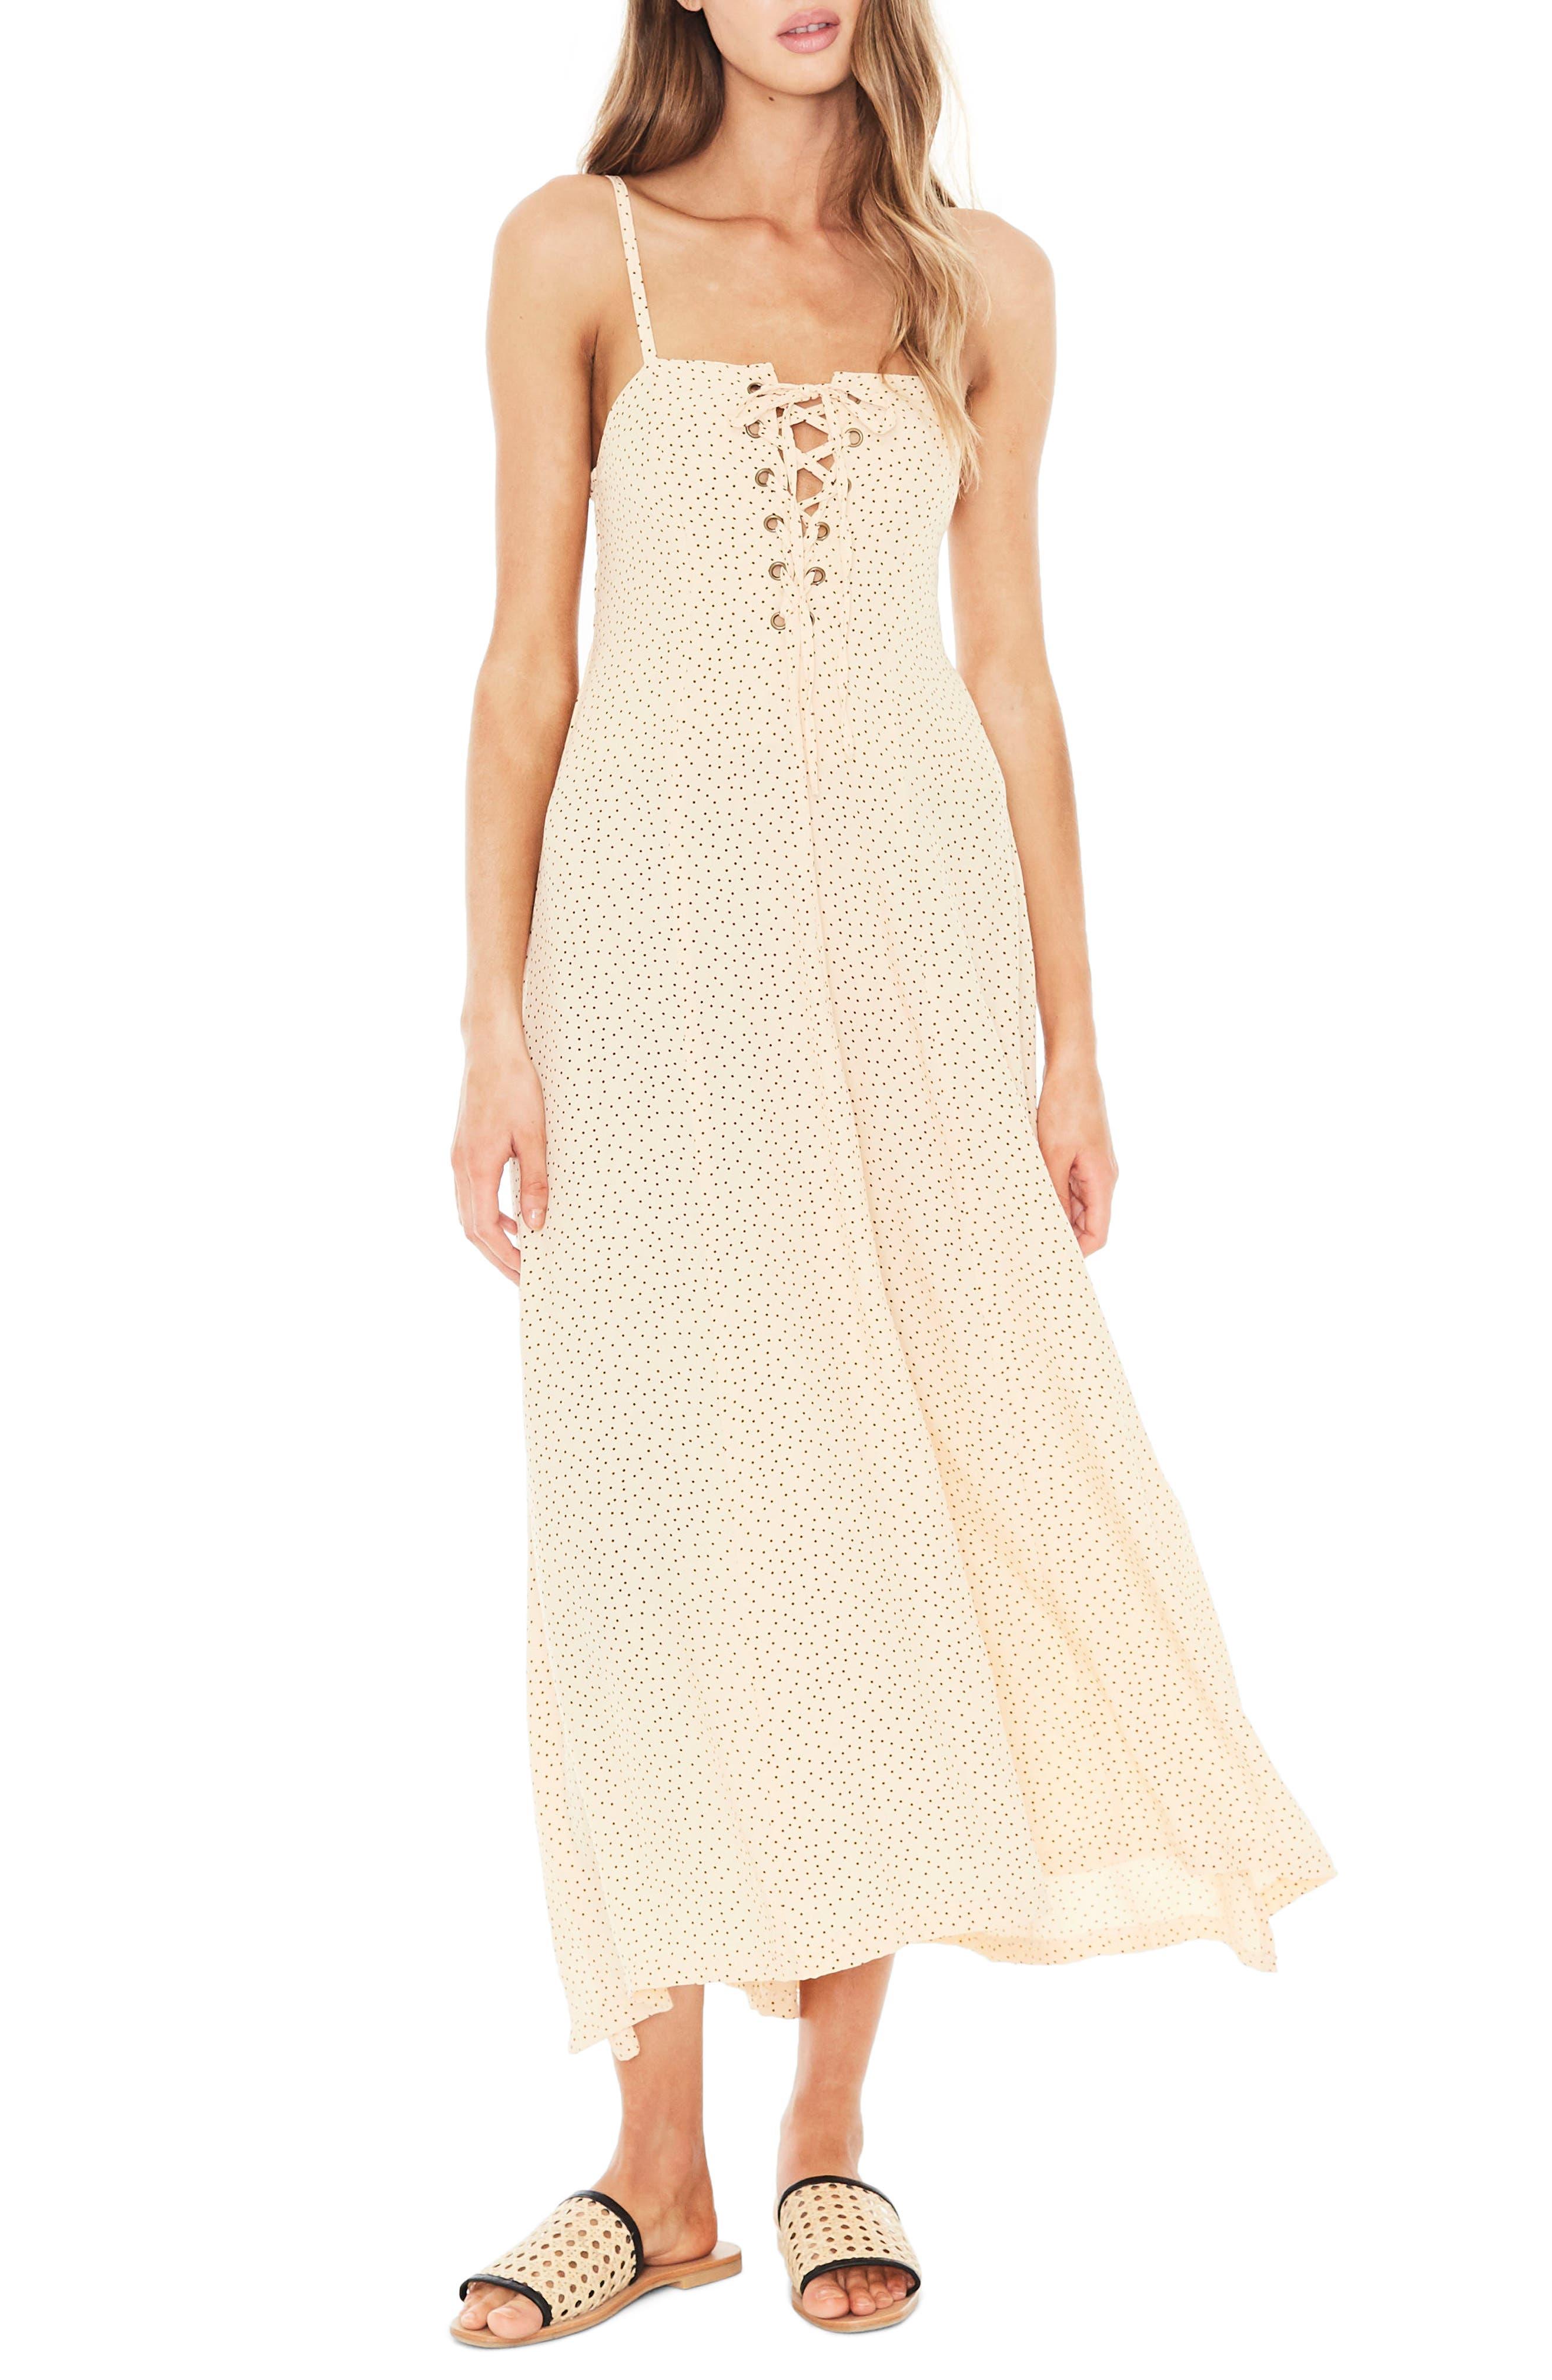 Mirador Lace-Up Midi Dress,                         Main,                         color, 900